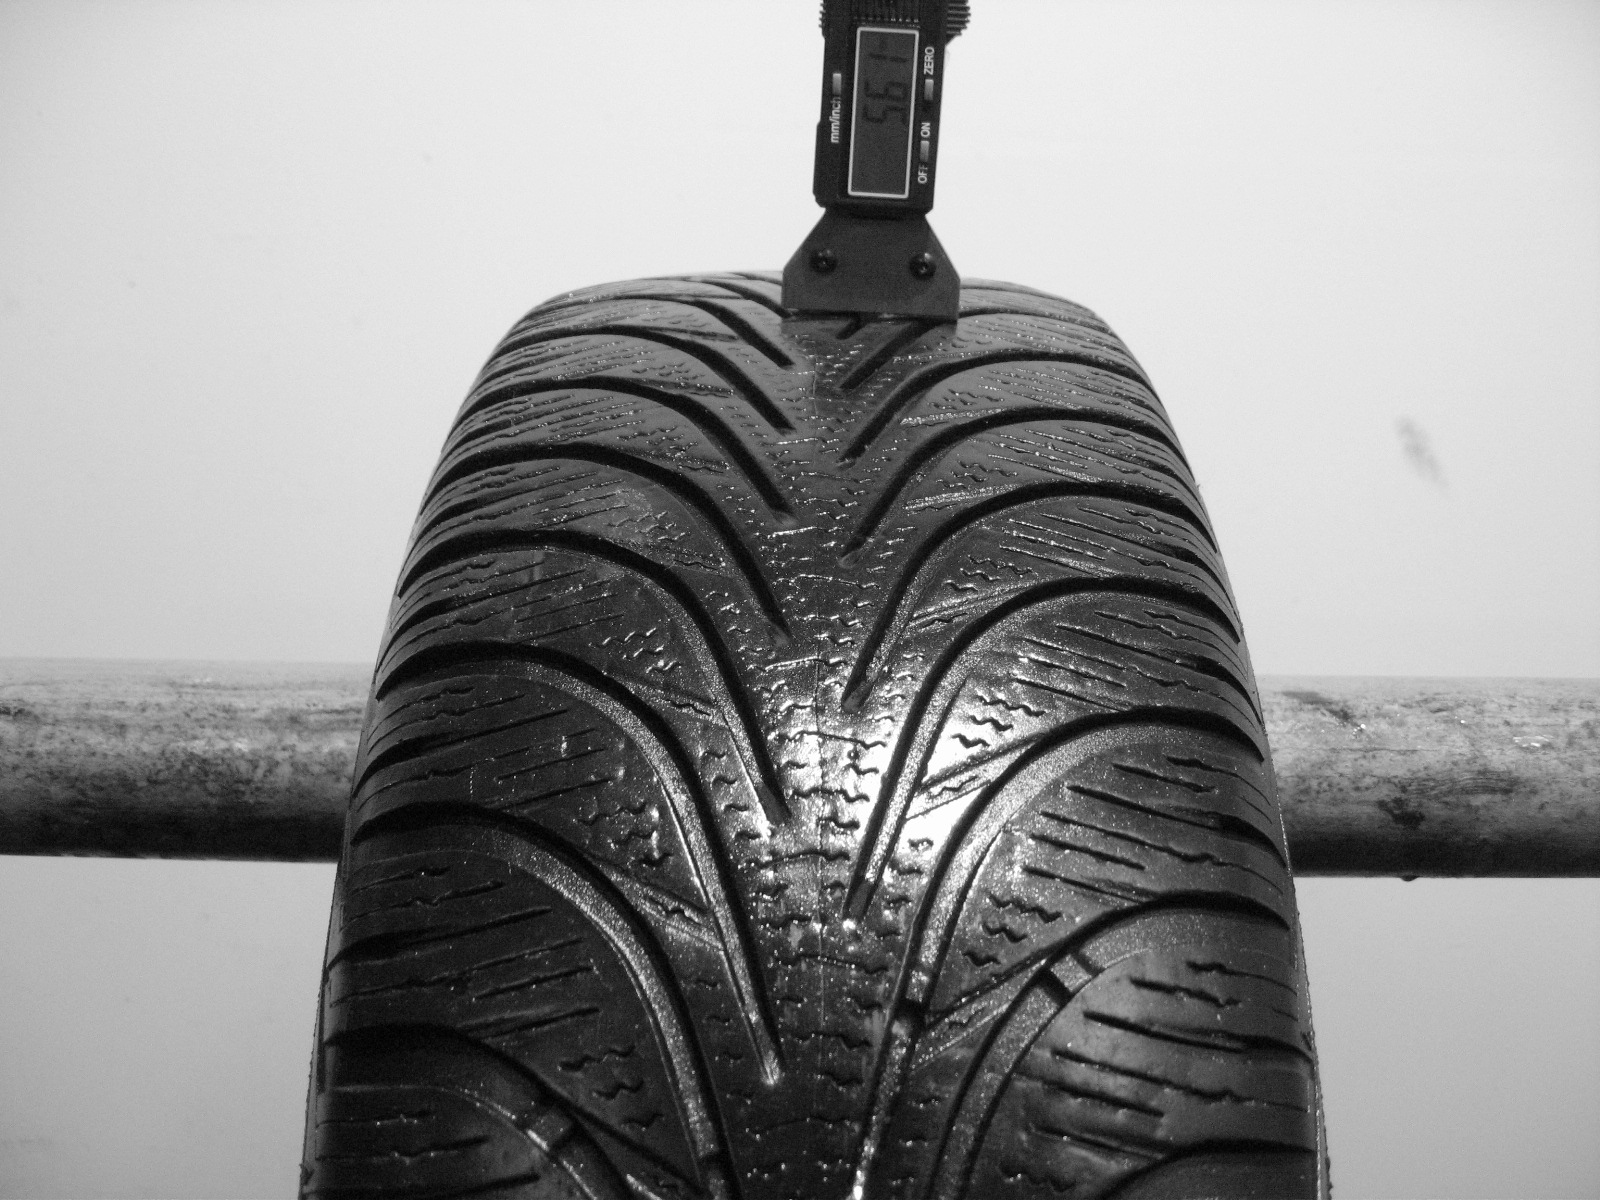 Použité-Pneu-Bazar - 195/60 R16 C GOODYEAR ULTRAGRIP 6-kusovka-rezerva 3mm